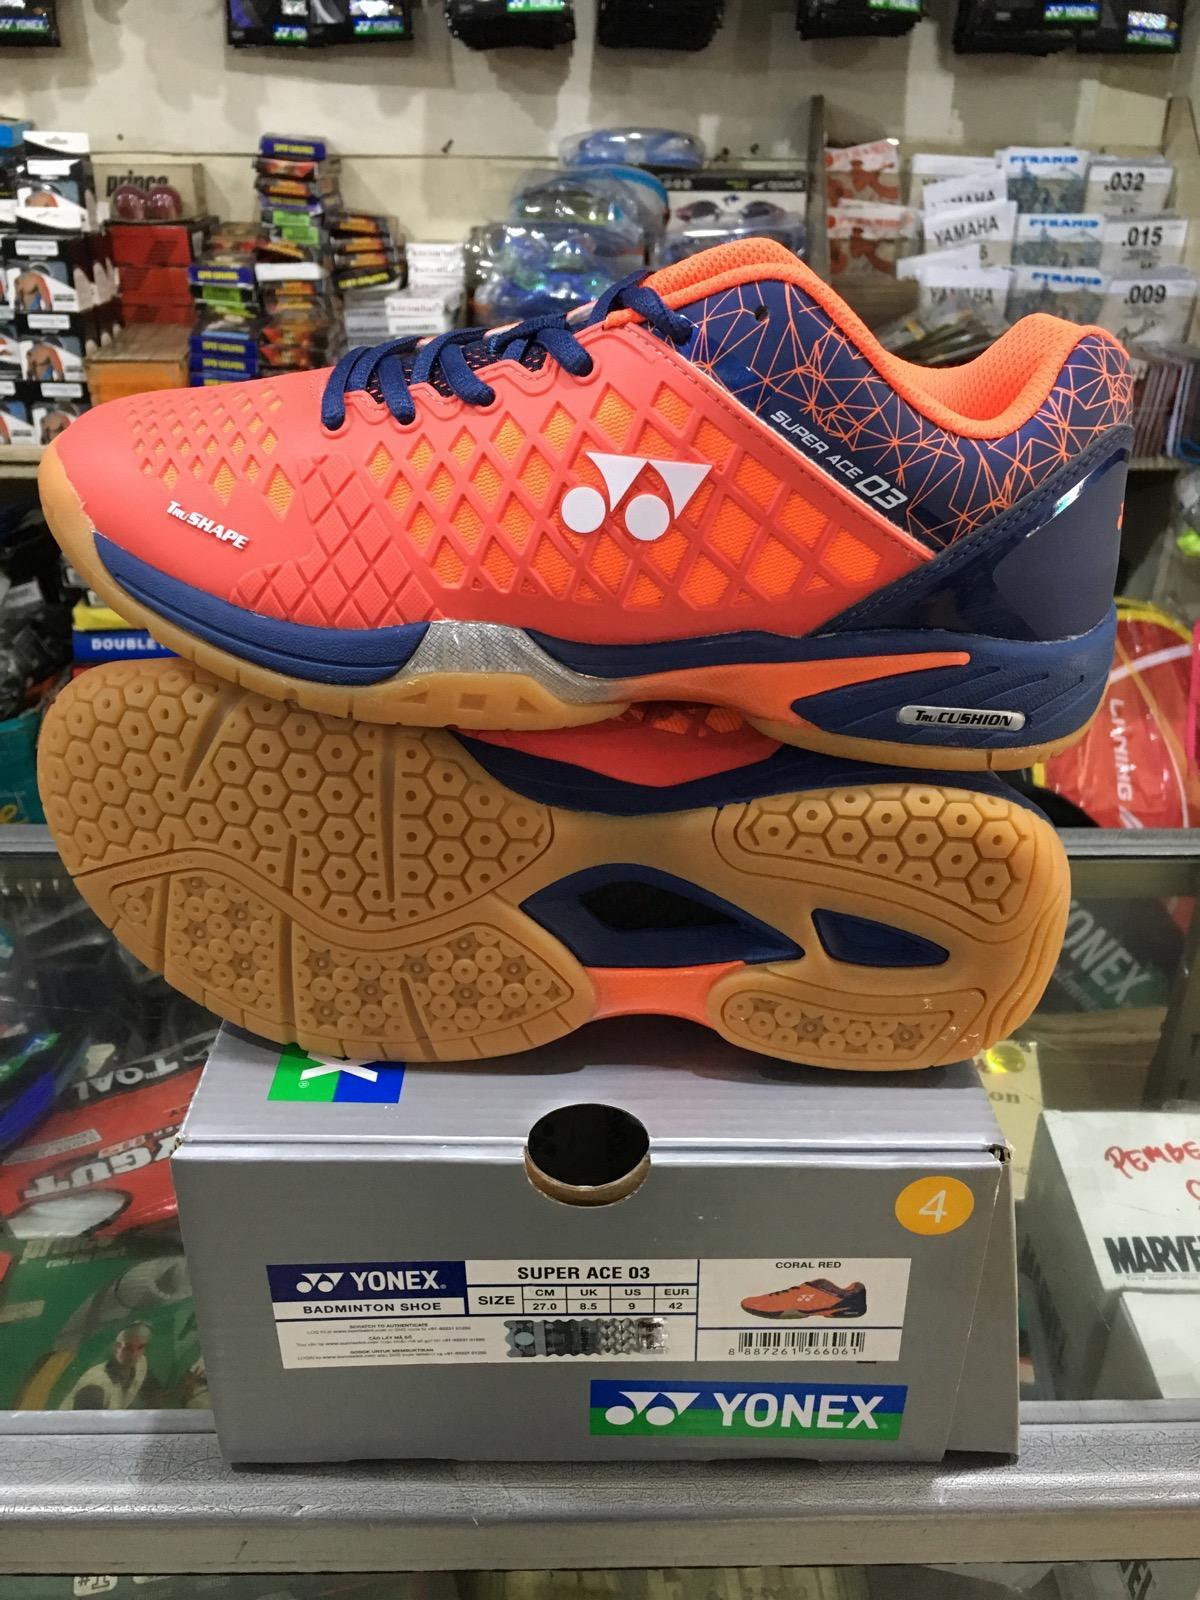 Yonex SUPER ACE 03 Sepatu Badminton (Coral Red) b903d2fc84